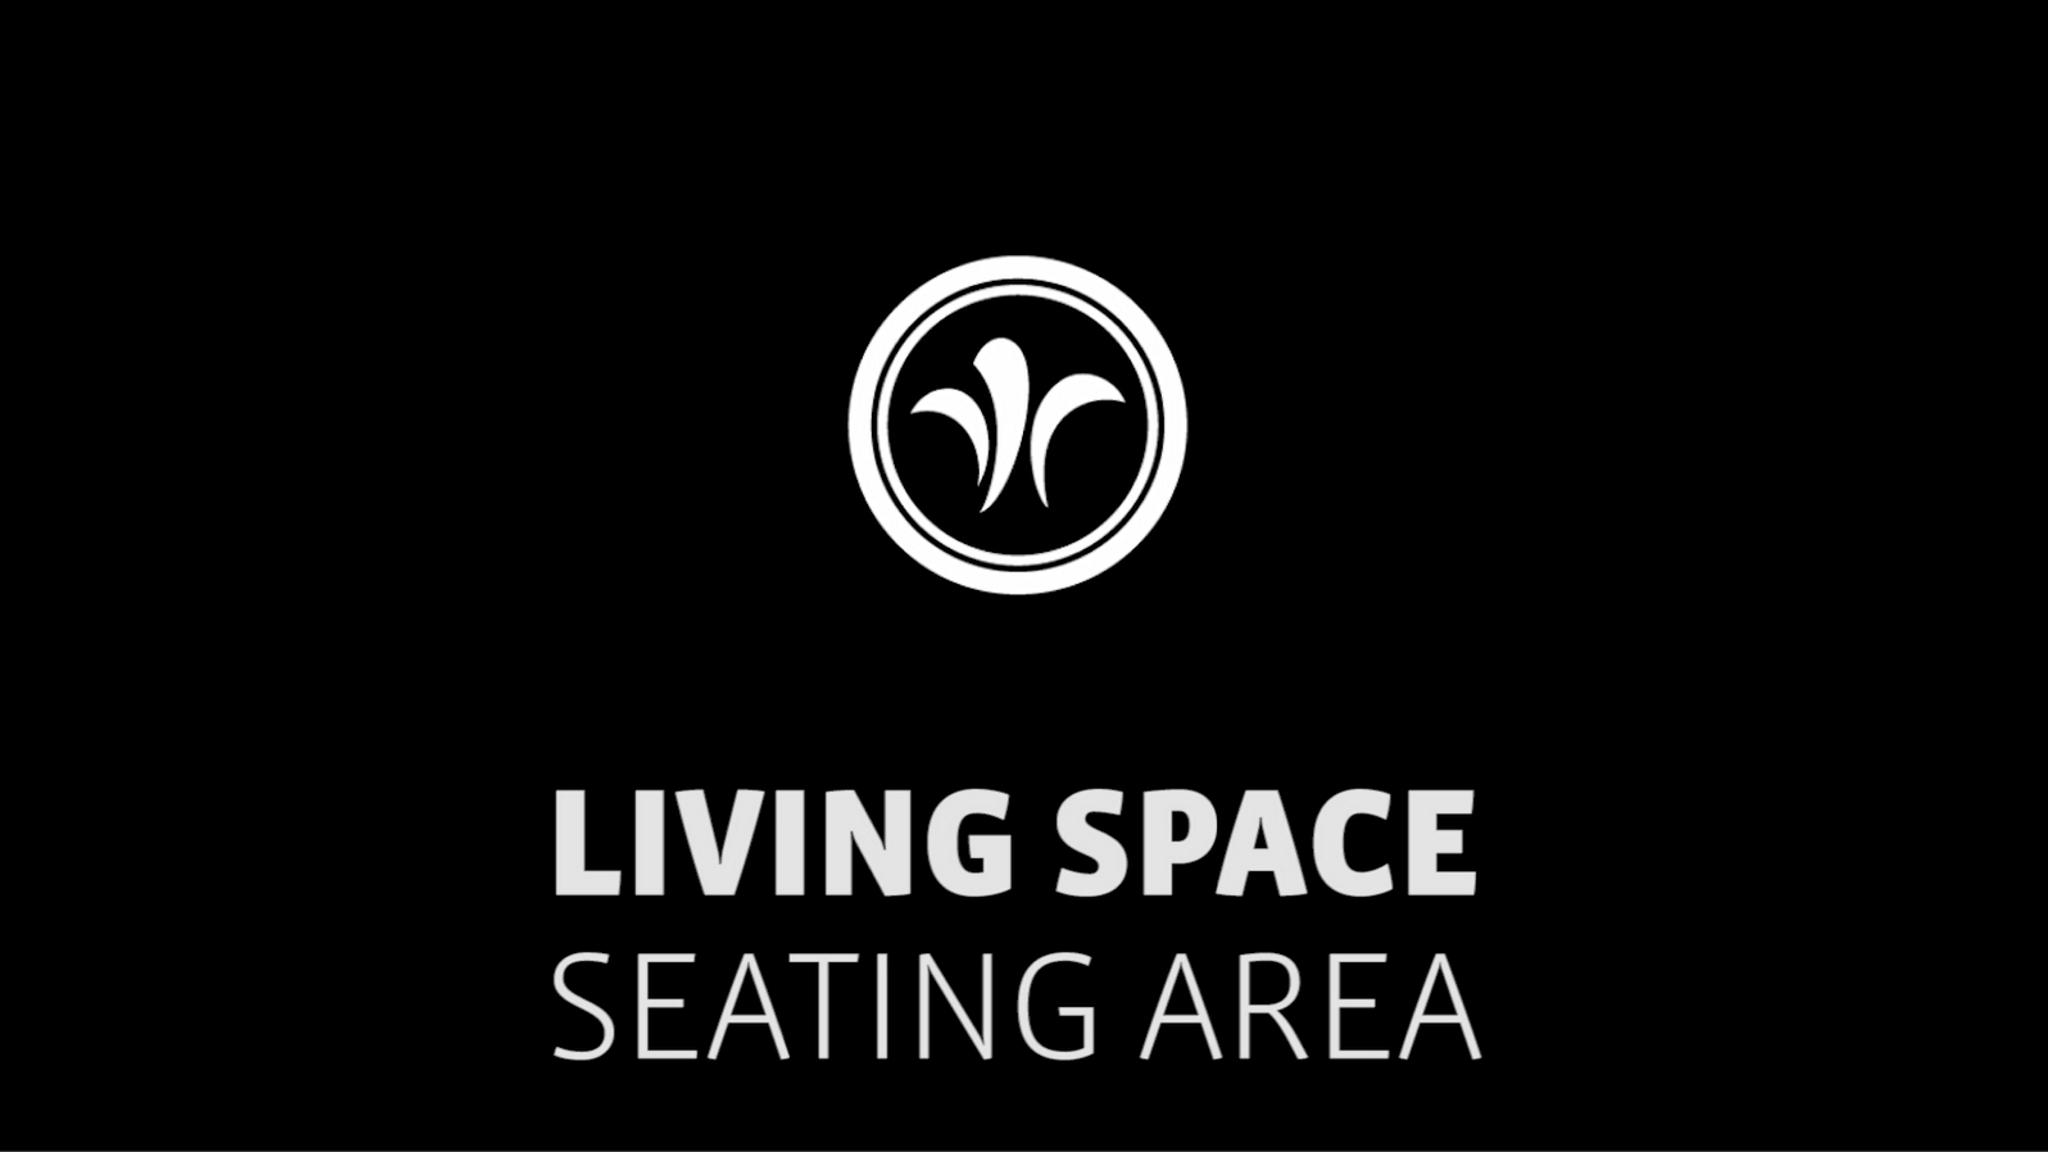 seating area in the motorhome // niesmann+bischoff - camper (model ARTO) // 2019 // WO6